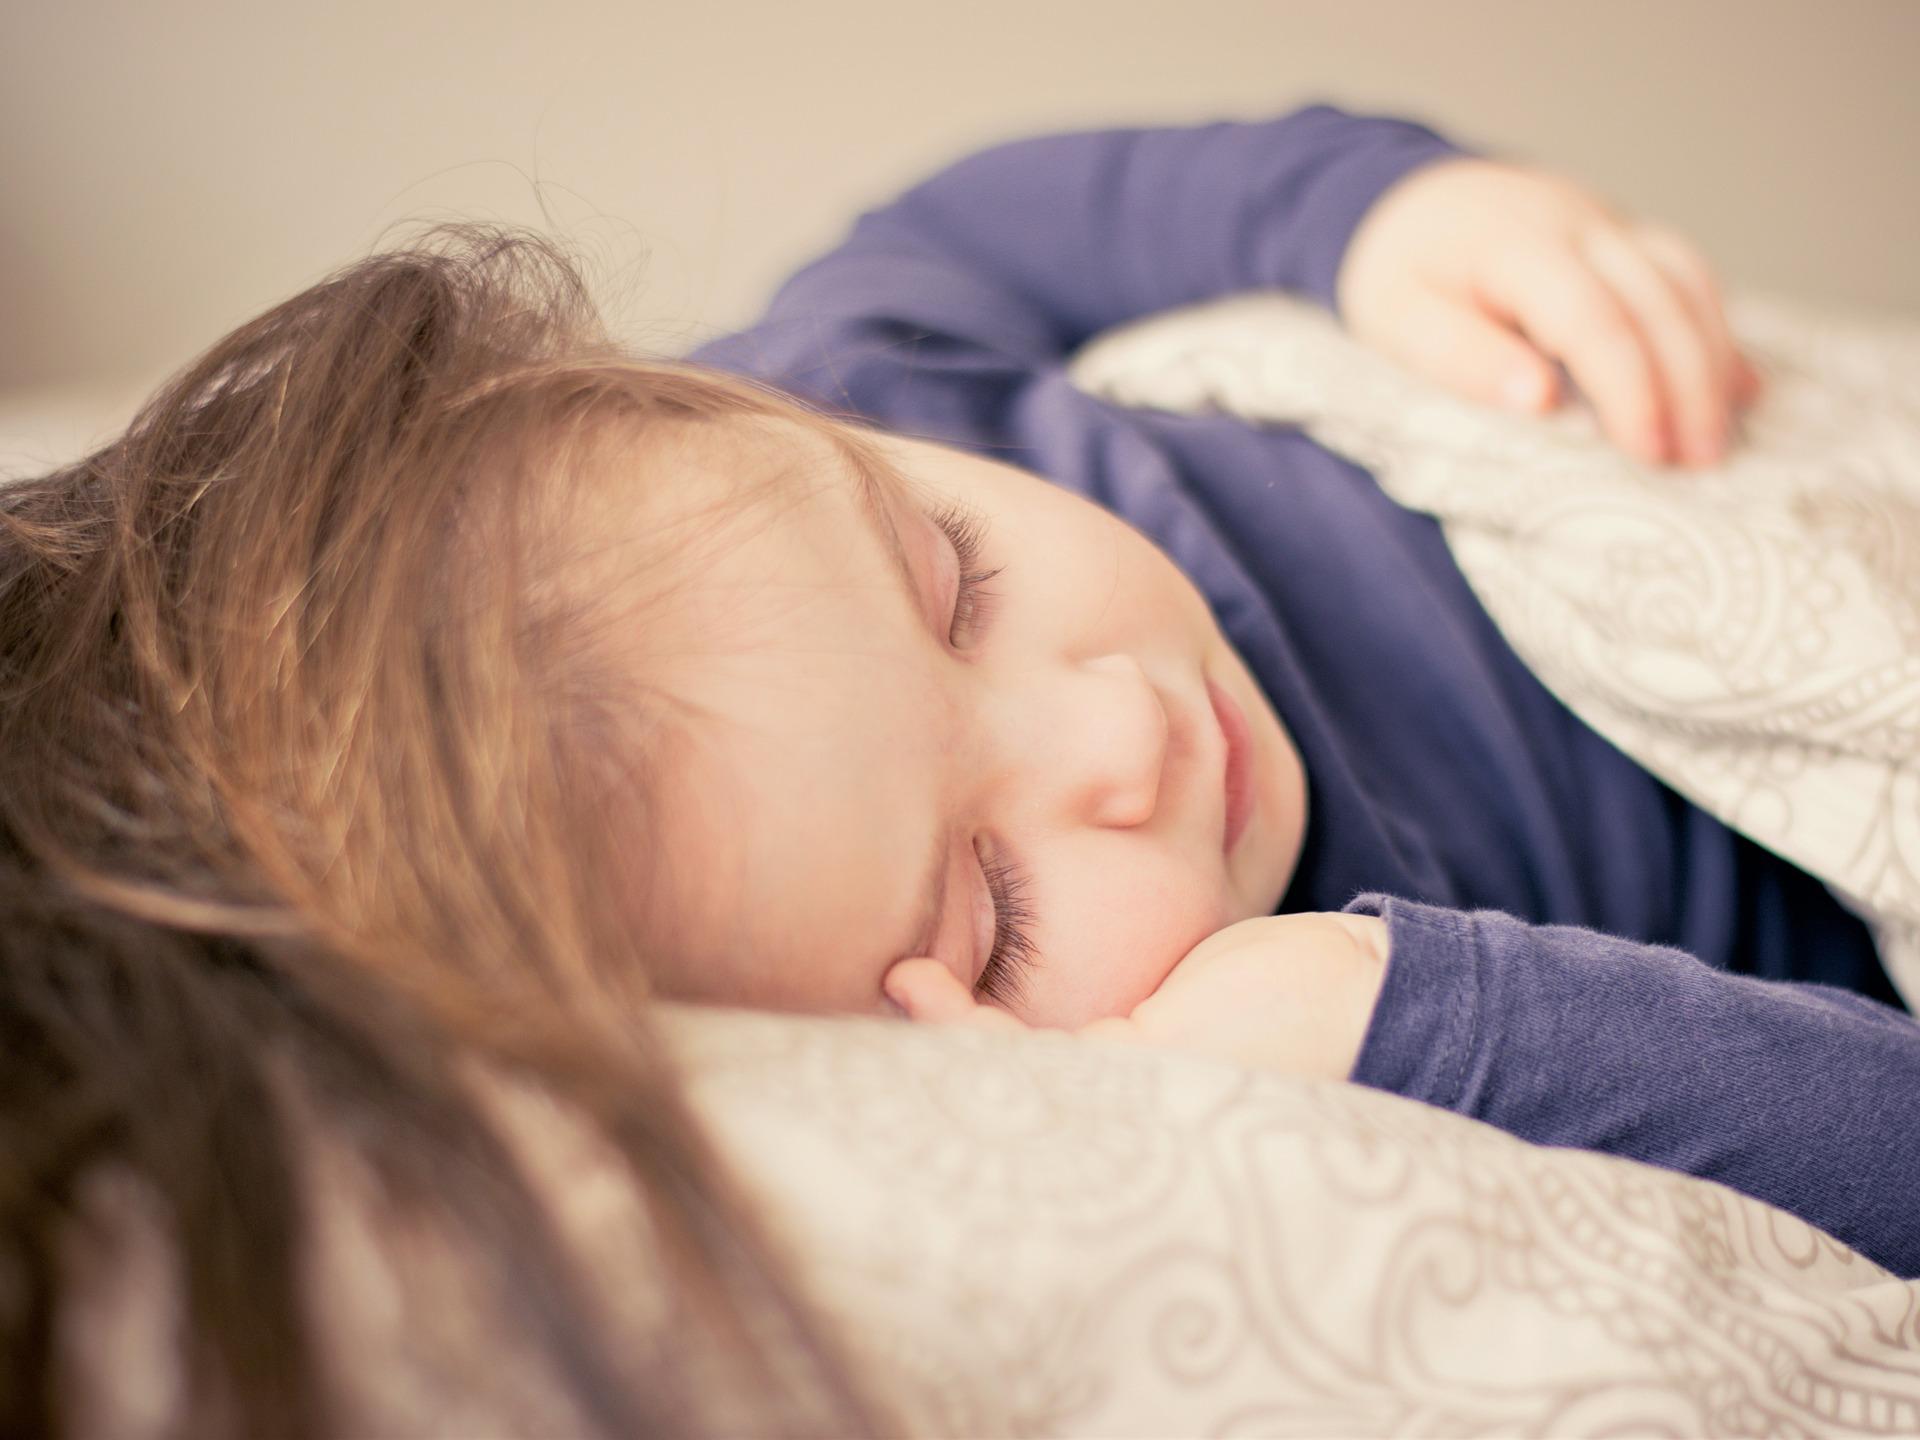 pixabay - child sleeping